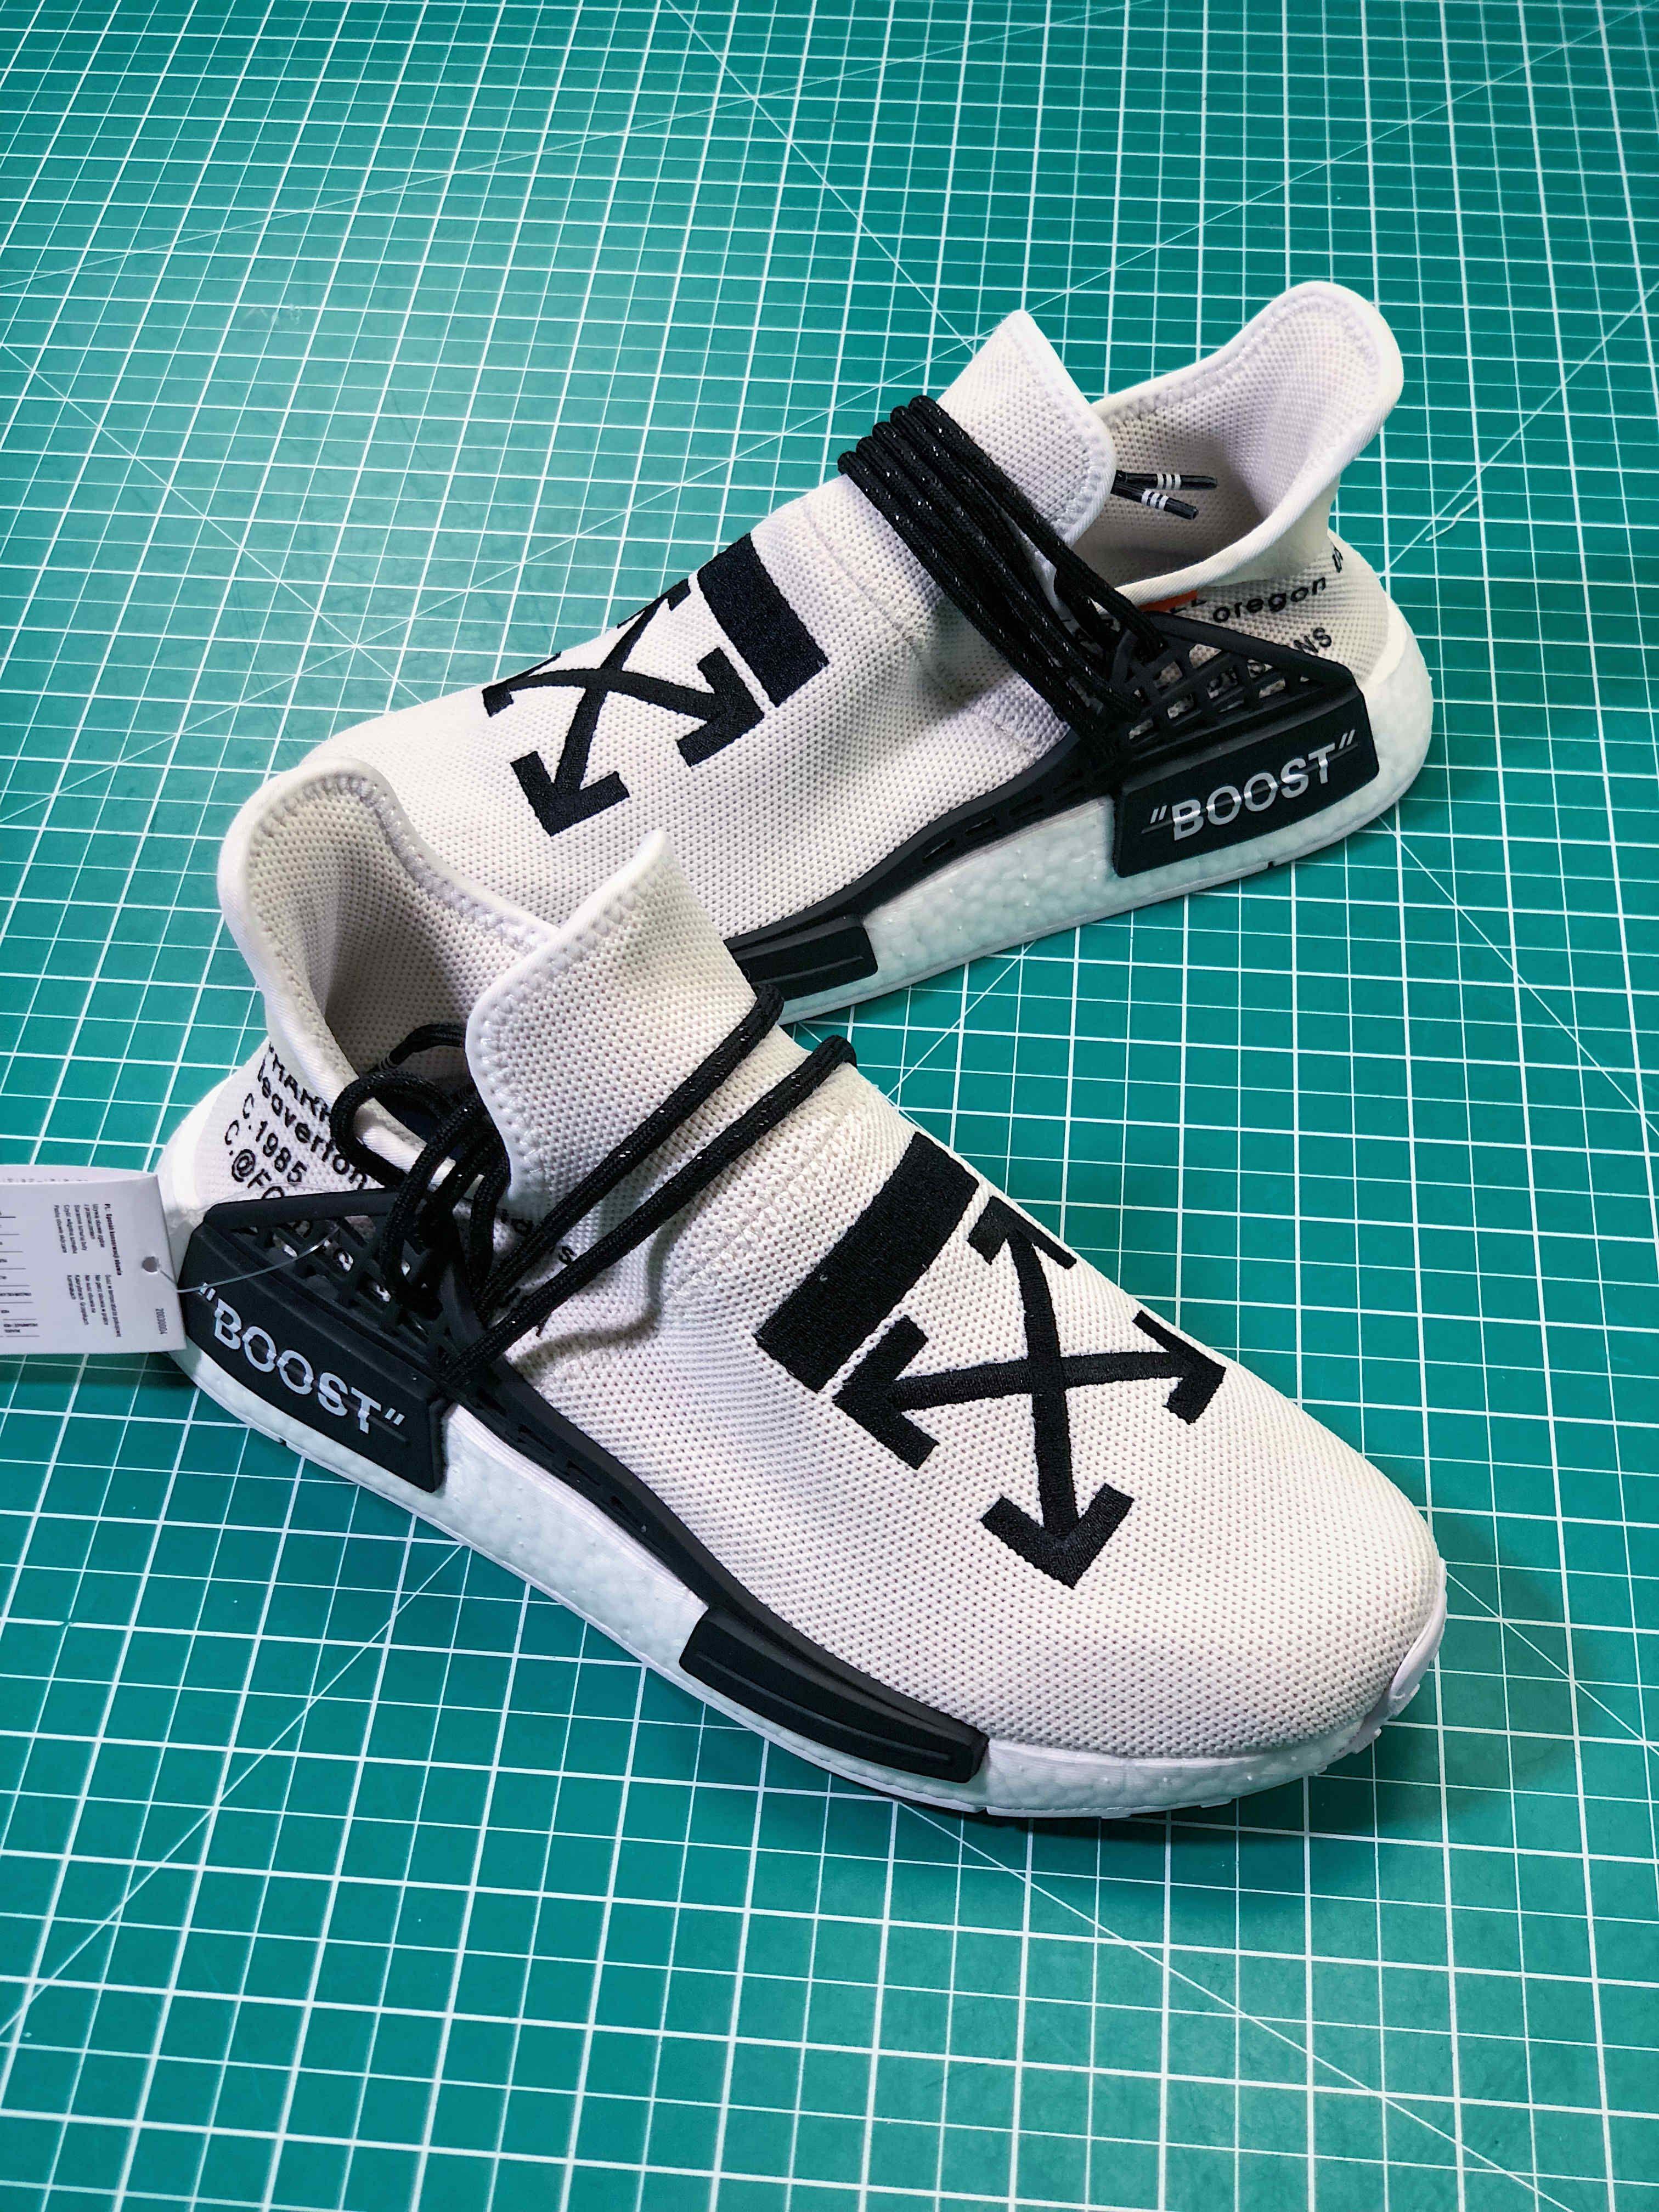 9fcb06a7af1a Custom Off-White x Adidas NMD HU Pharrell Human Race White Black ...